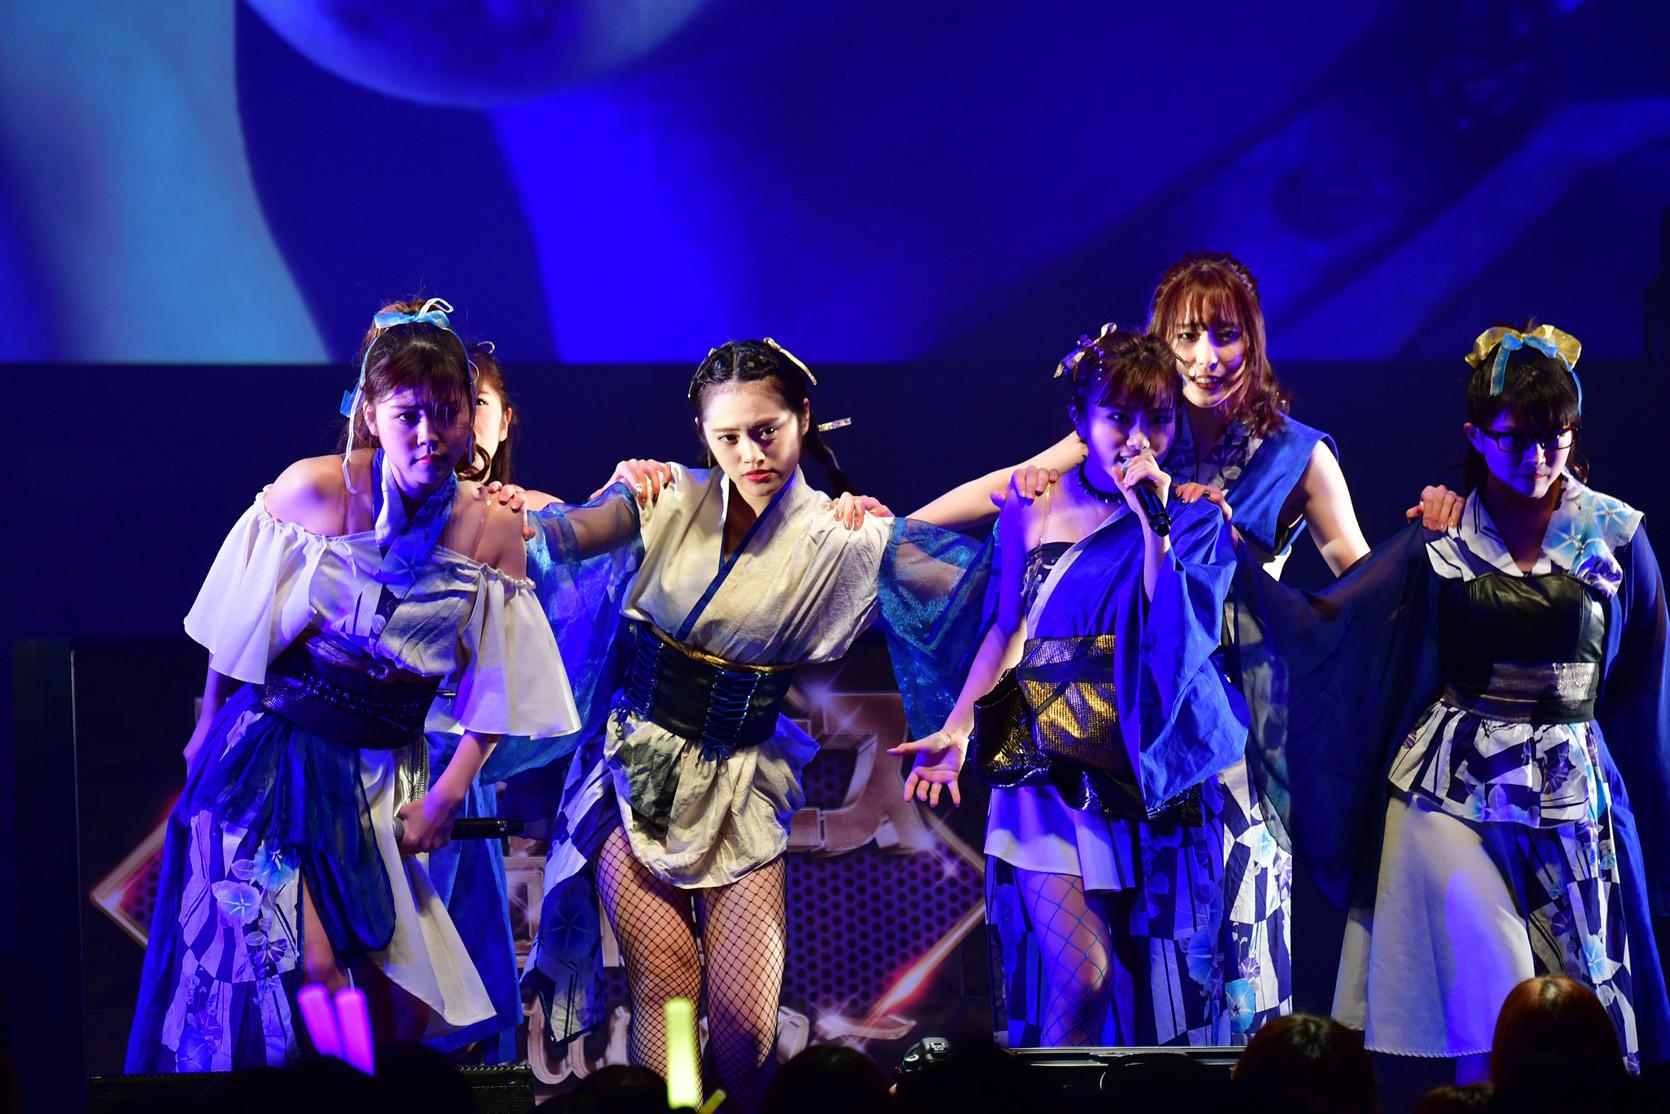 http://news.yoshimoto.co.jp/20181201025523-6eee88709f720818b39356ec898a7cfc082f7d84.jpg